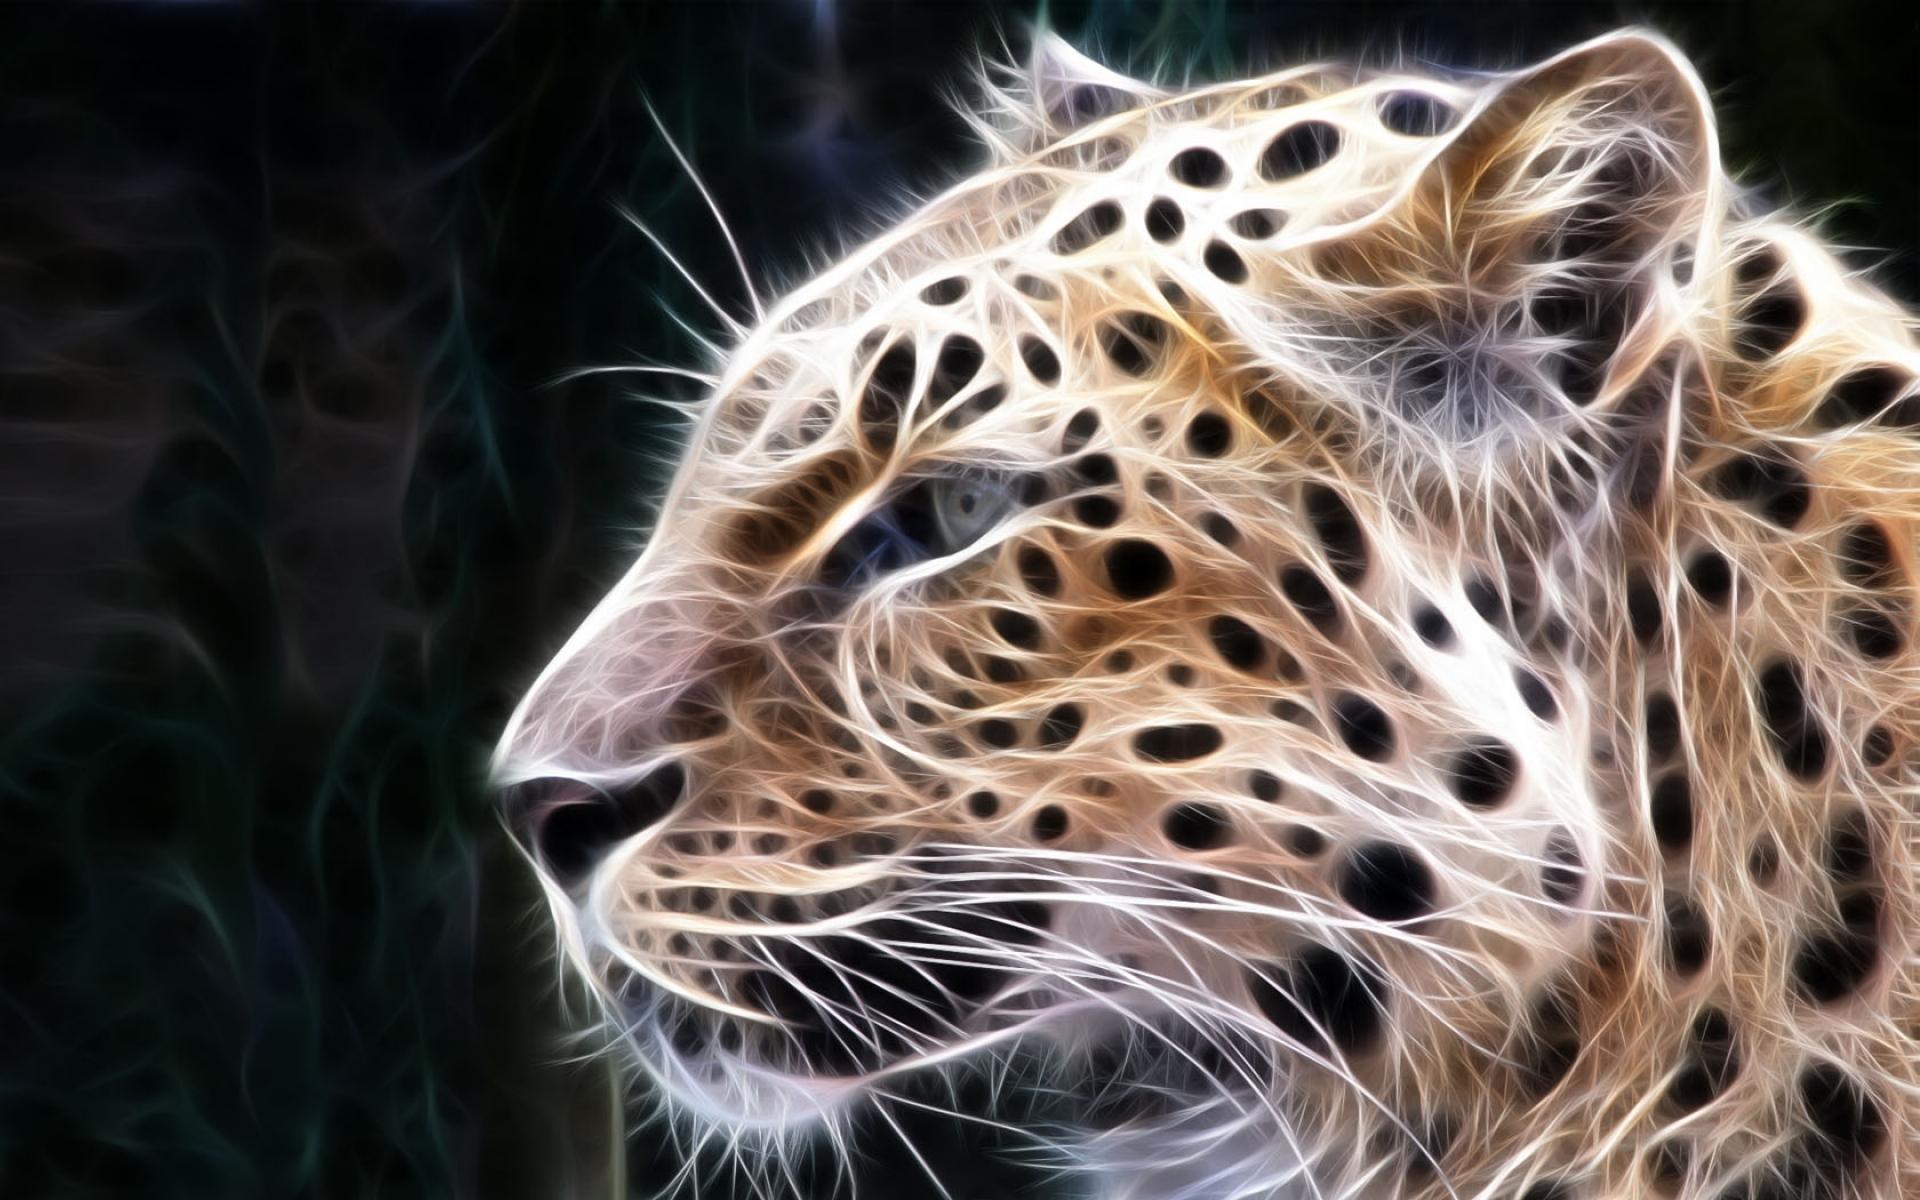 Картинки Леопард, свет, линии, свечение фото и обои на рабочий стол